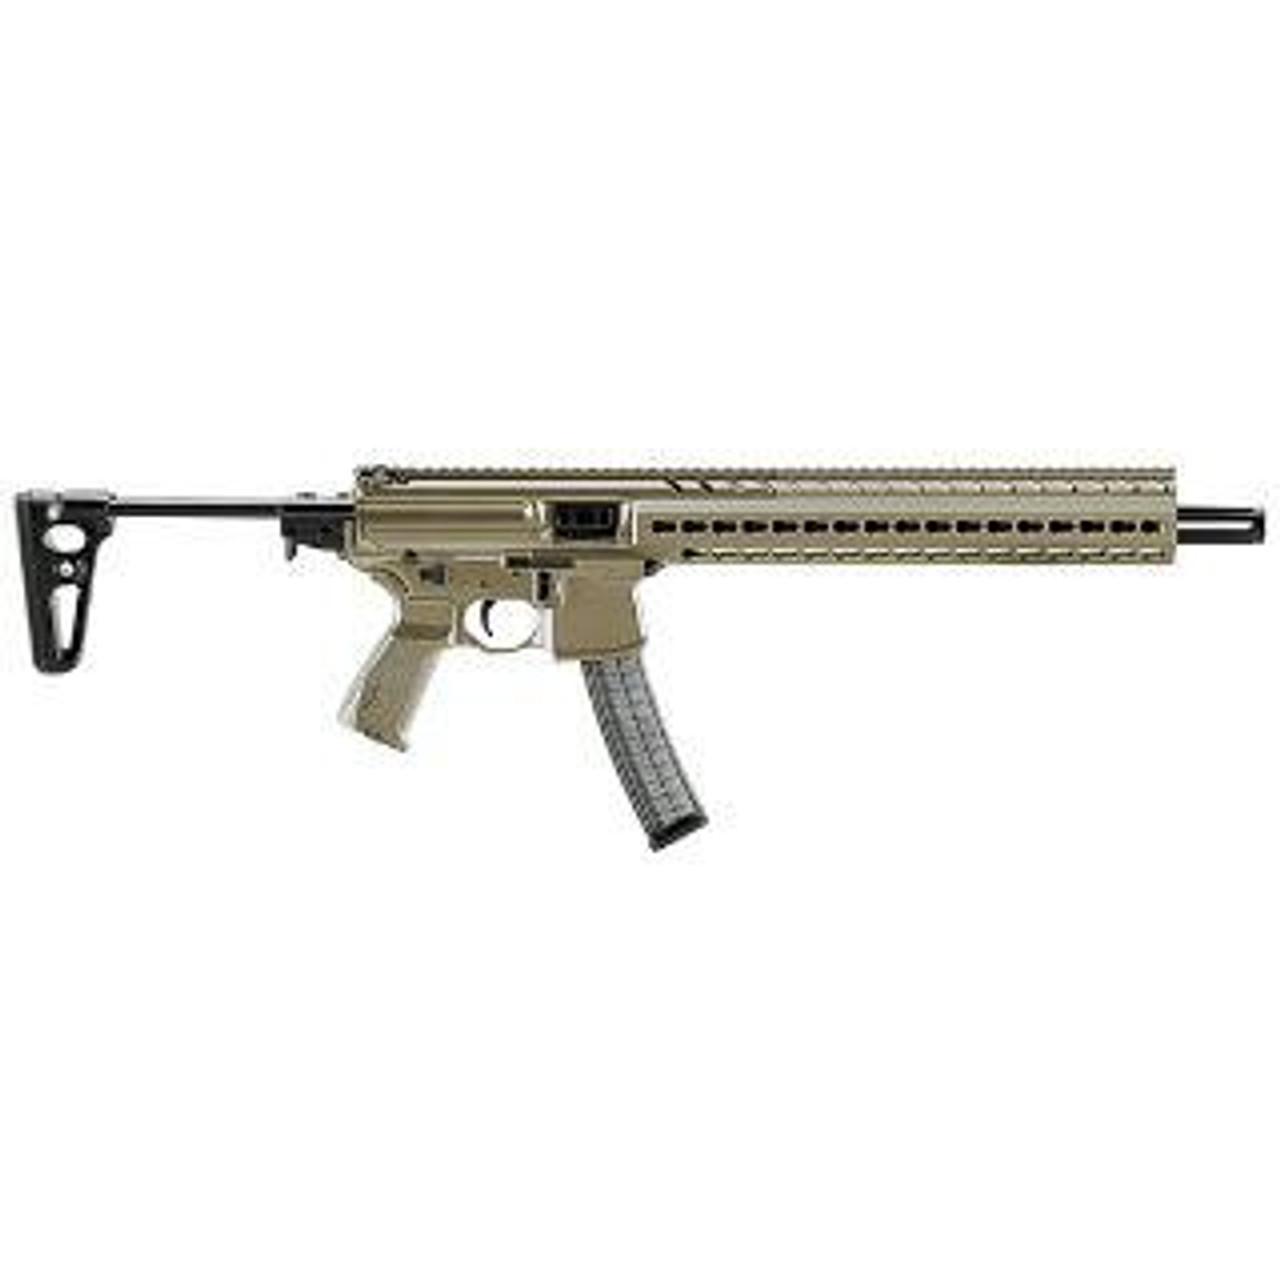 Sig Sauer MPX-Carbine - CALIFORNIA LEGAL - 9mm- FDE